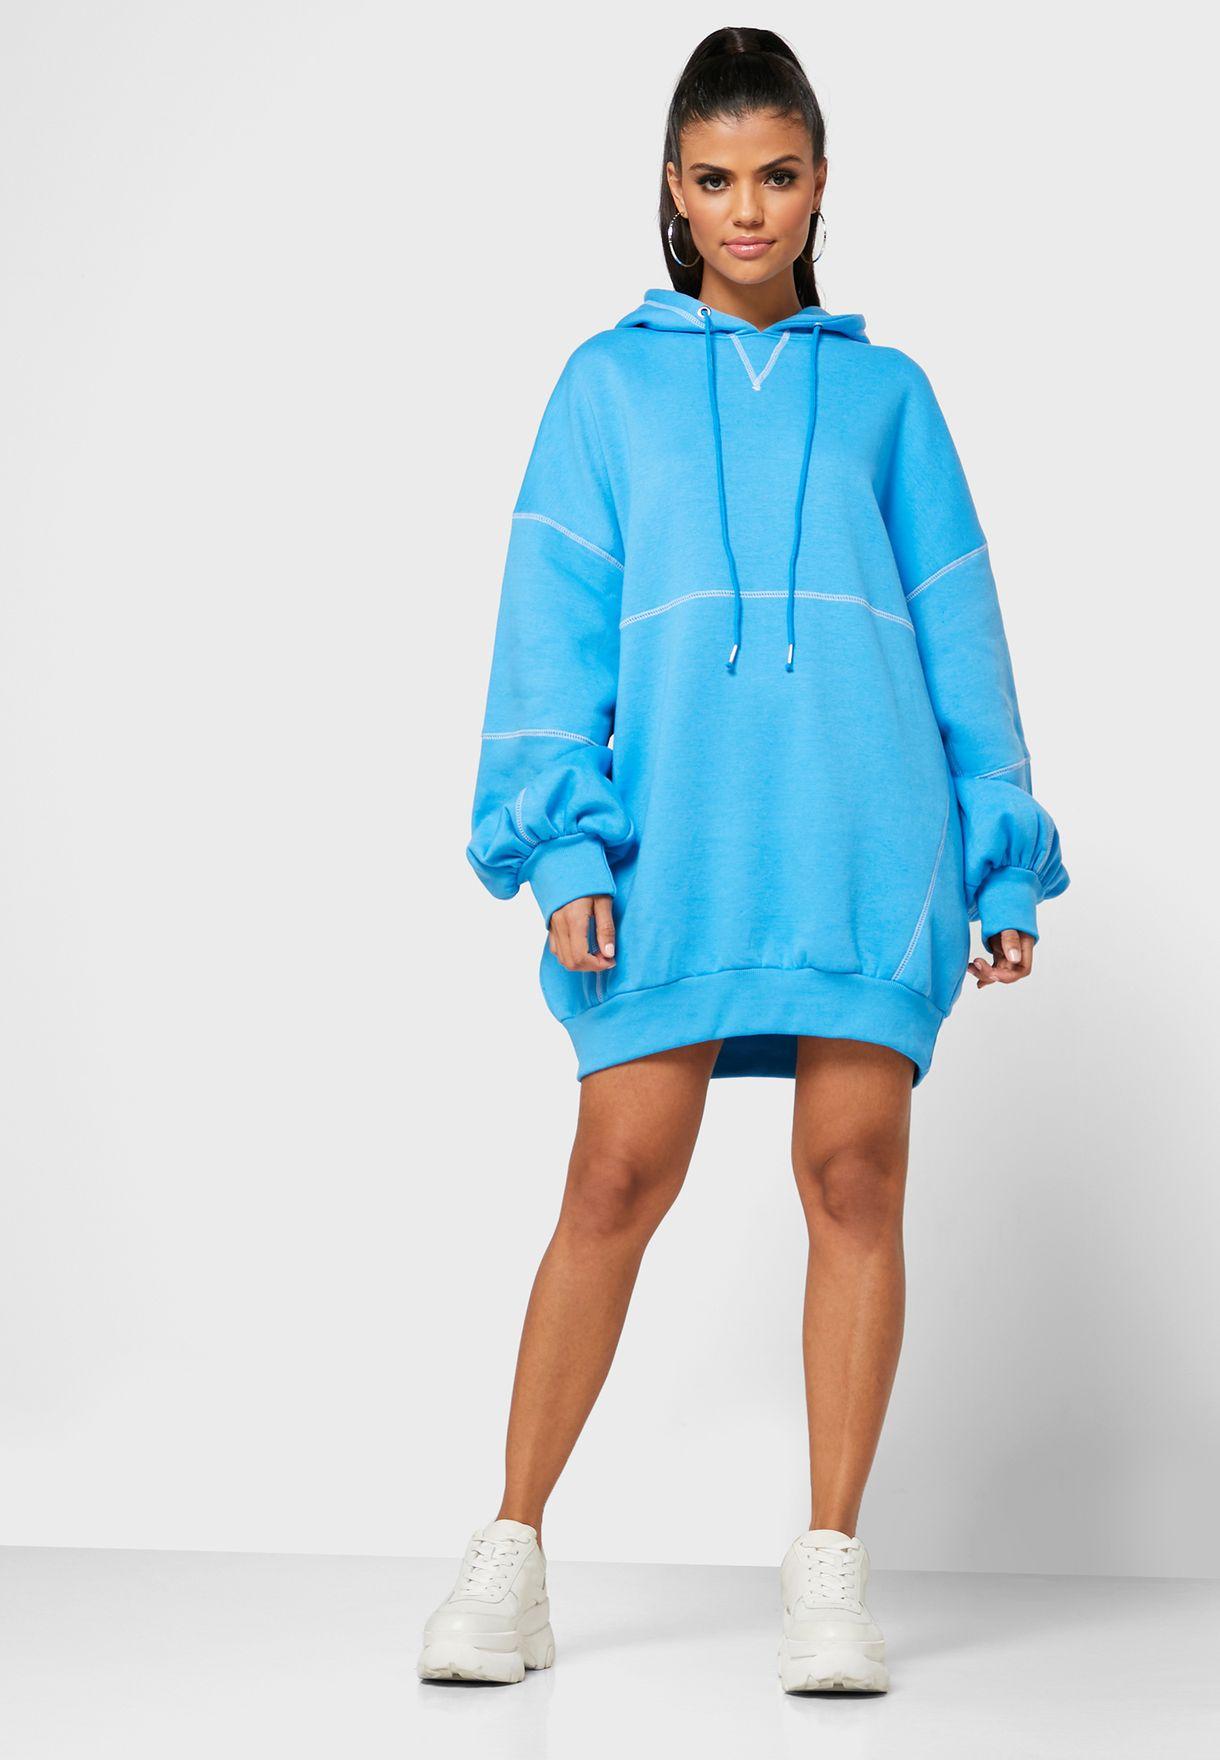 Seam Detail Hooded Sweat Dress